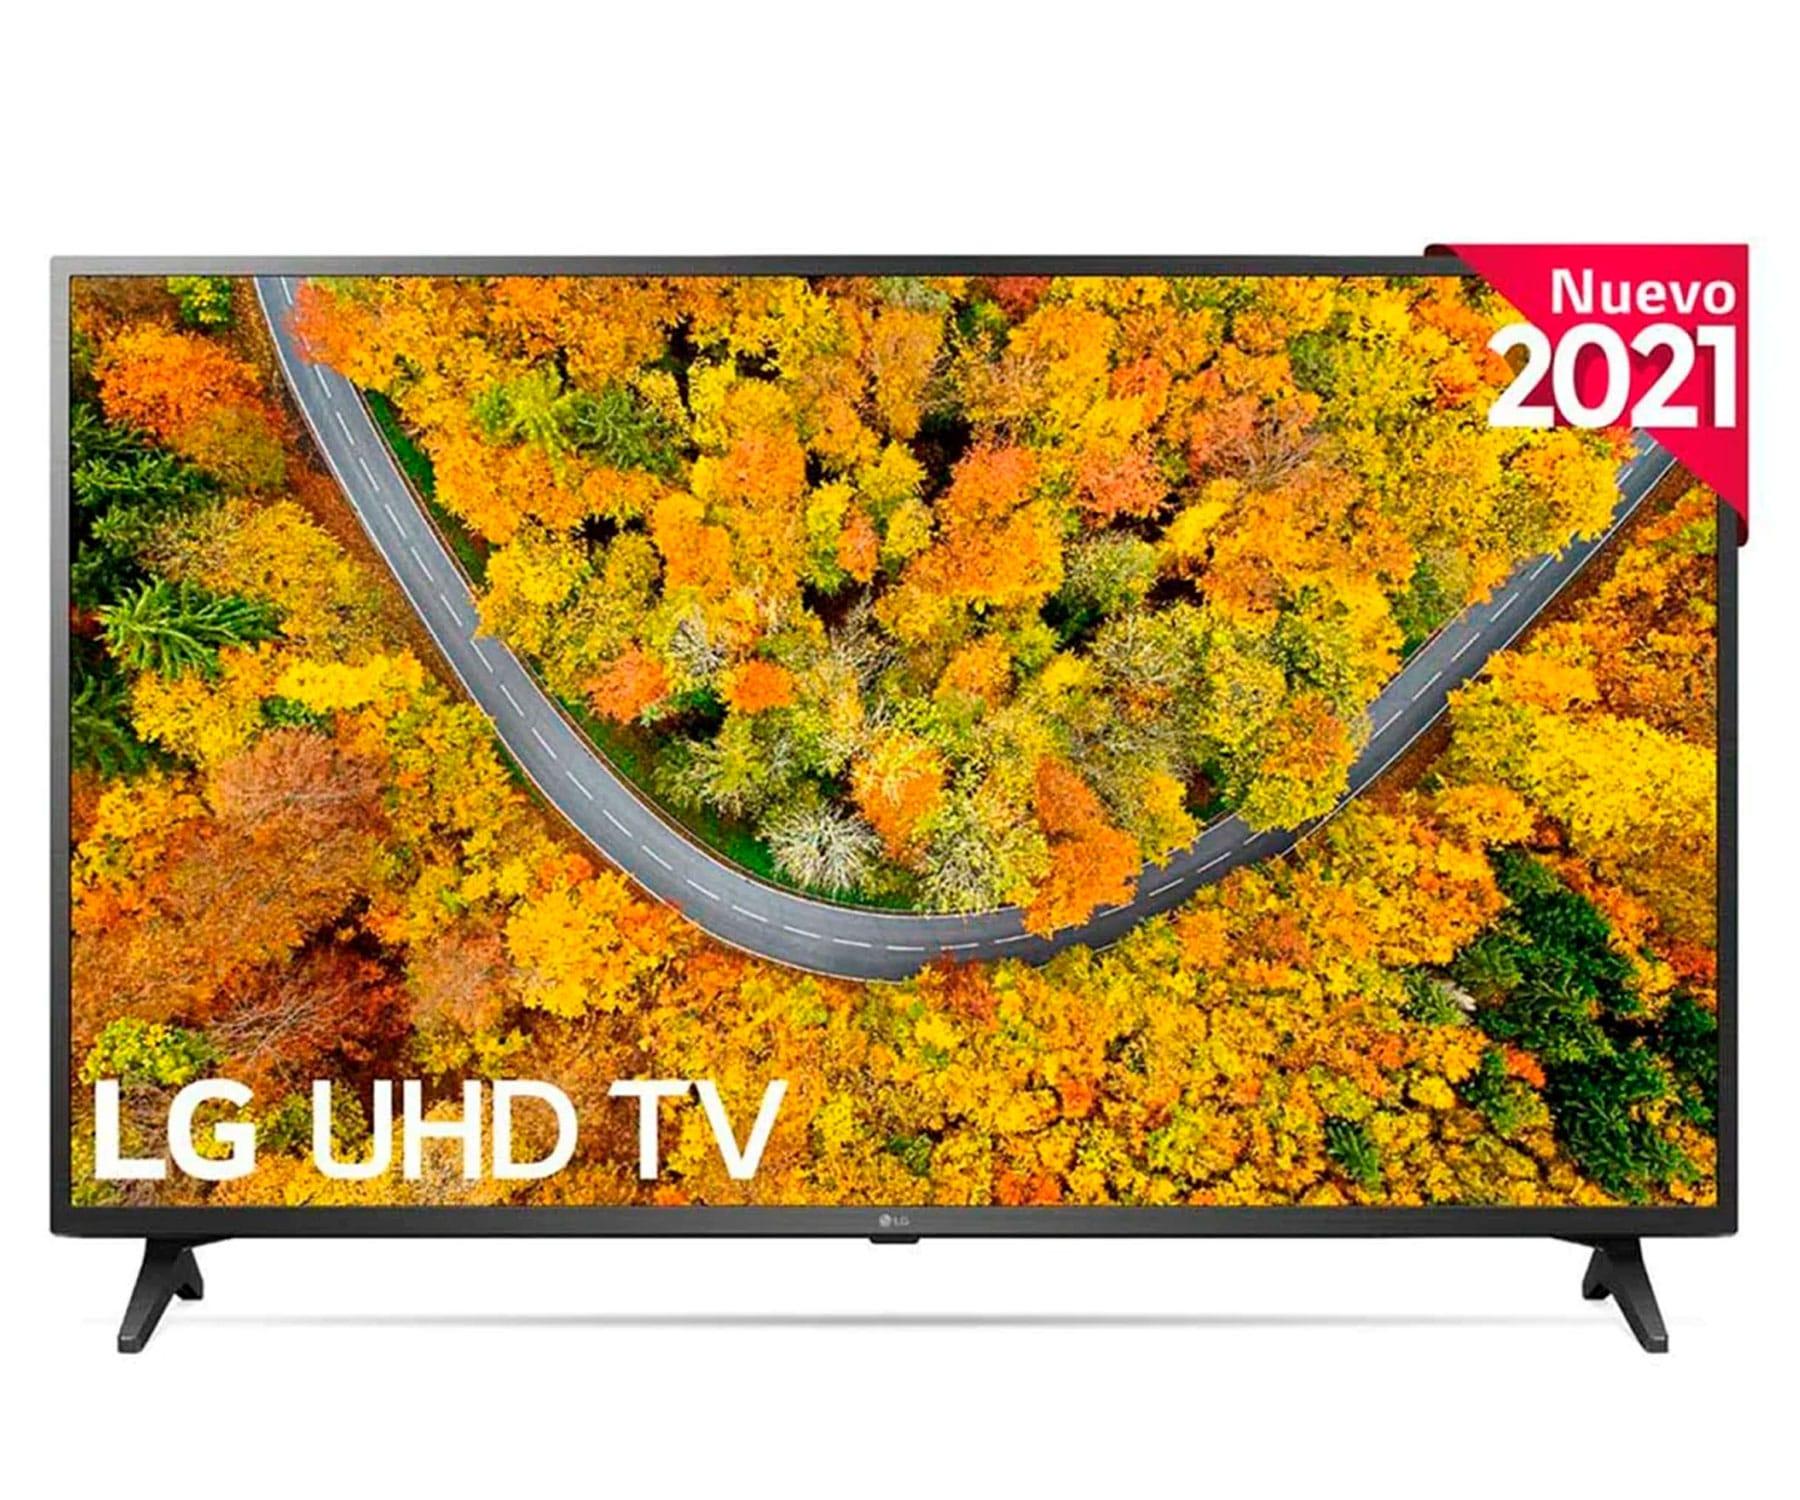 "LG 55UP75006LF 4K UHD 55""/SMARTTV/WEBOS 6.0/4K QUAD CORE/GAMING TV/COMPATIBLE HDR10 PRO/HLG"